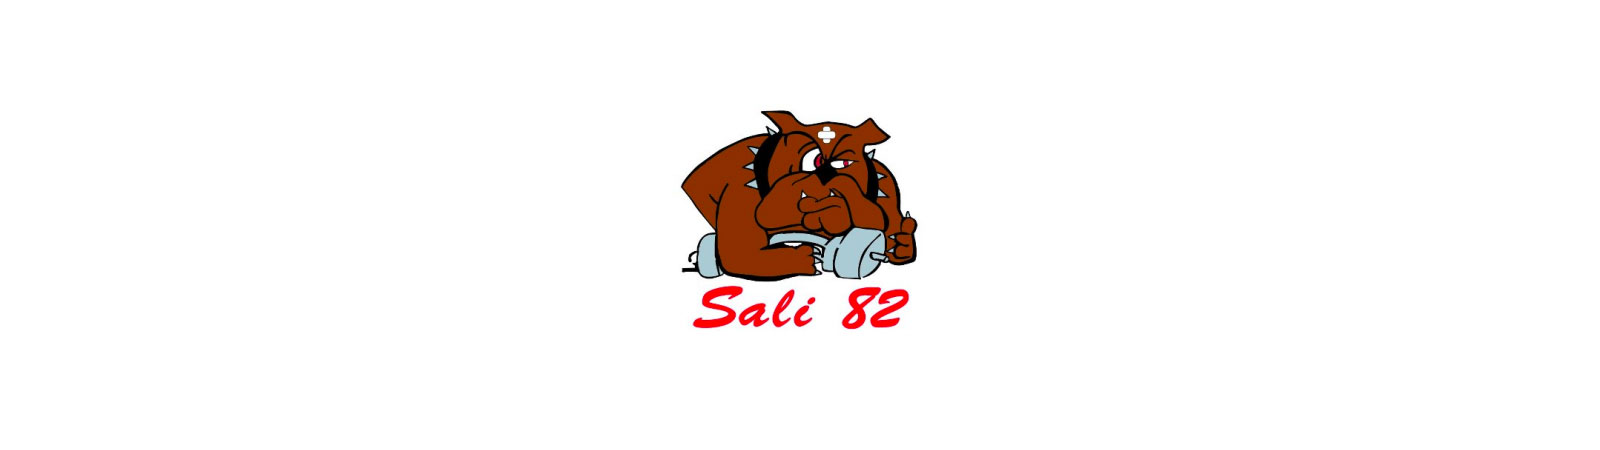 Sali82